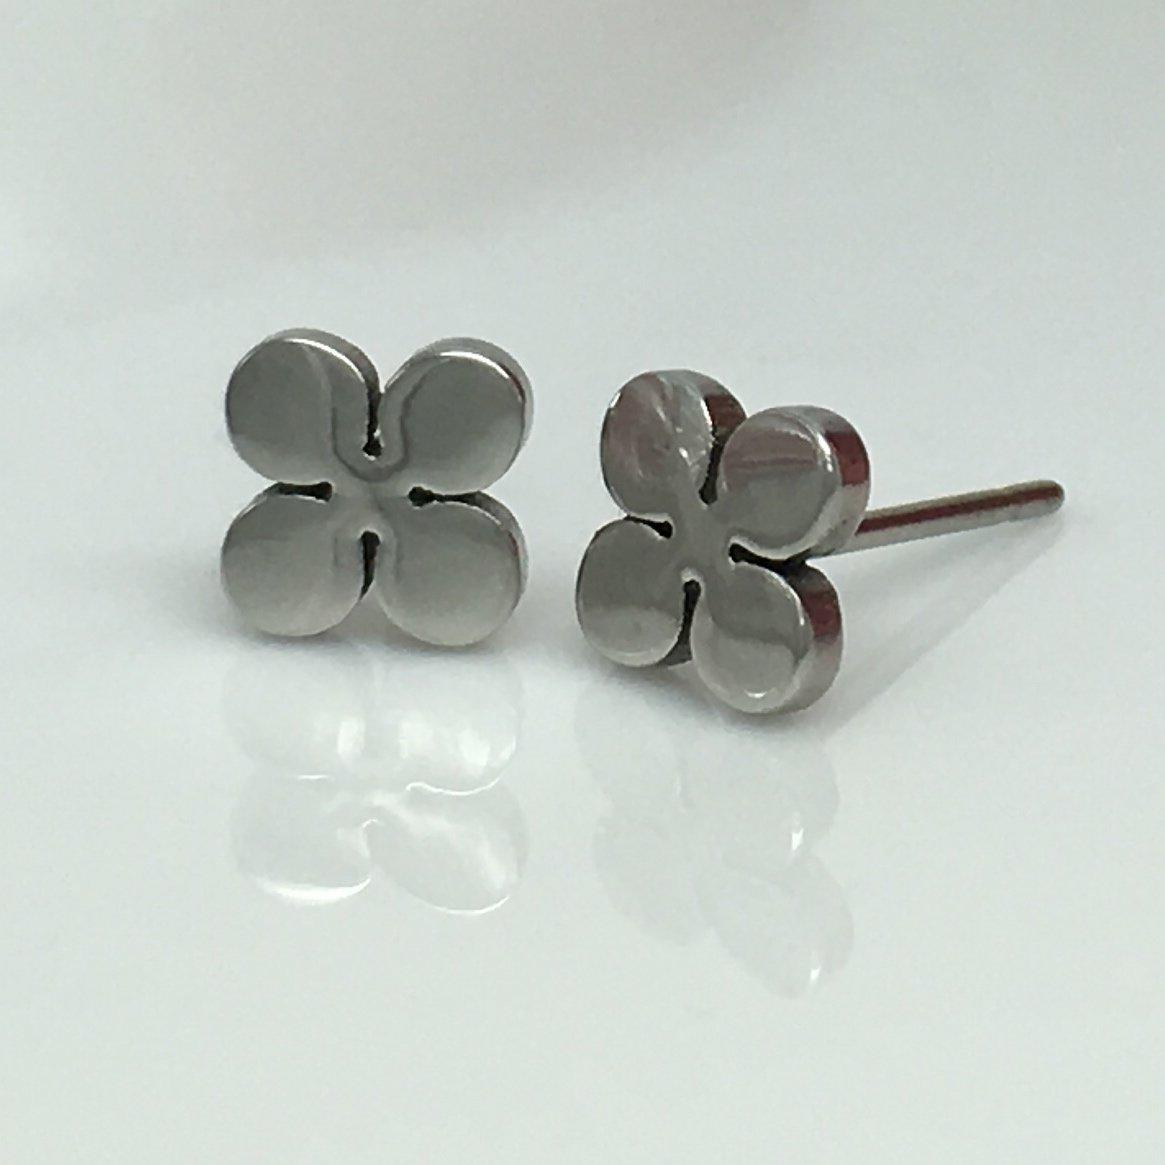 Four leaf clover stud earrings, good luck stud earrings, men's stud earrings, EC416